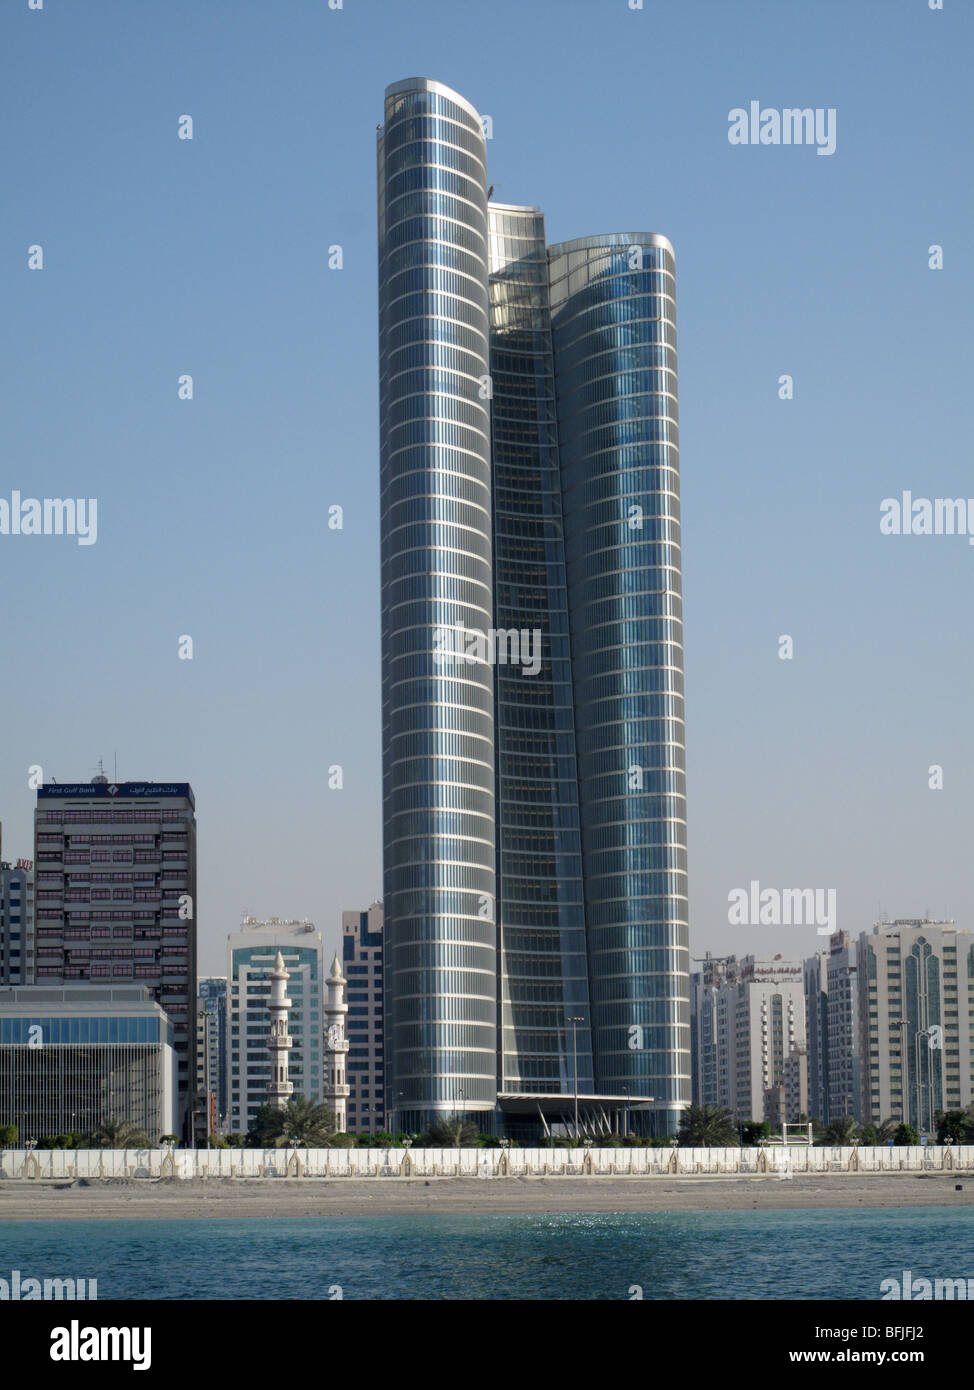 Modern tall buildings on the Corniche seafront, Abu Dhabi, UAE - Stock Image